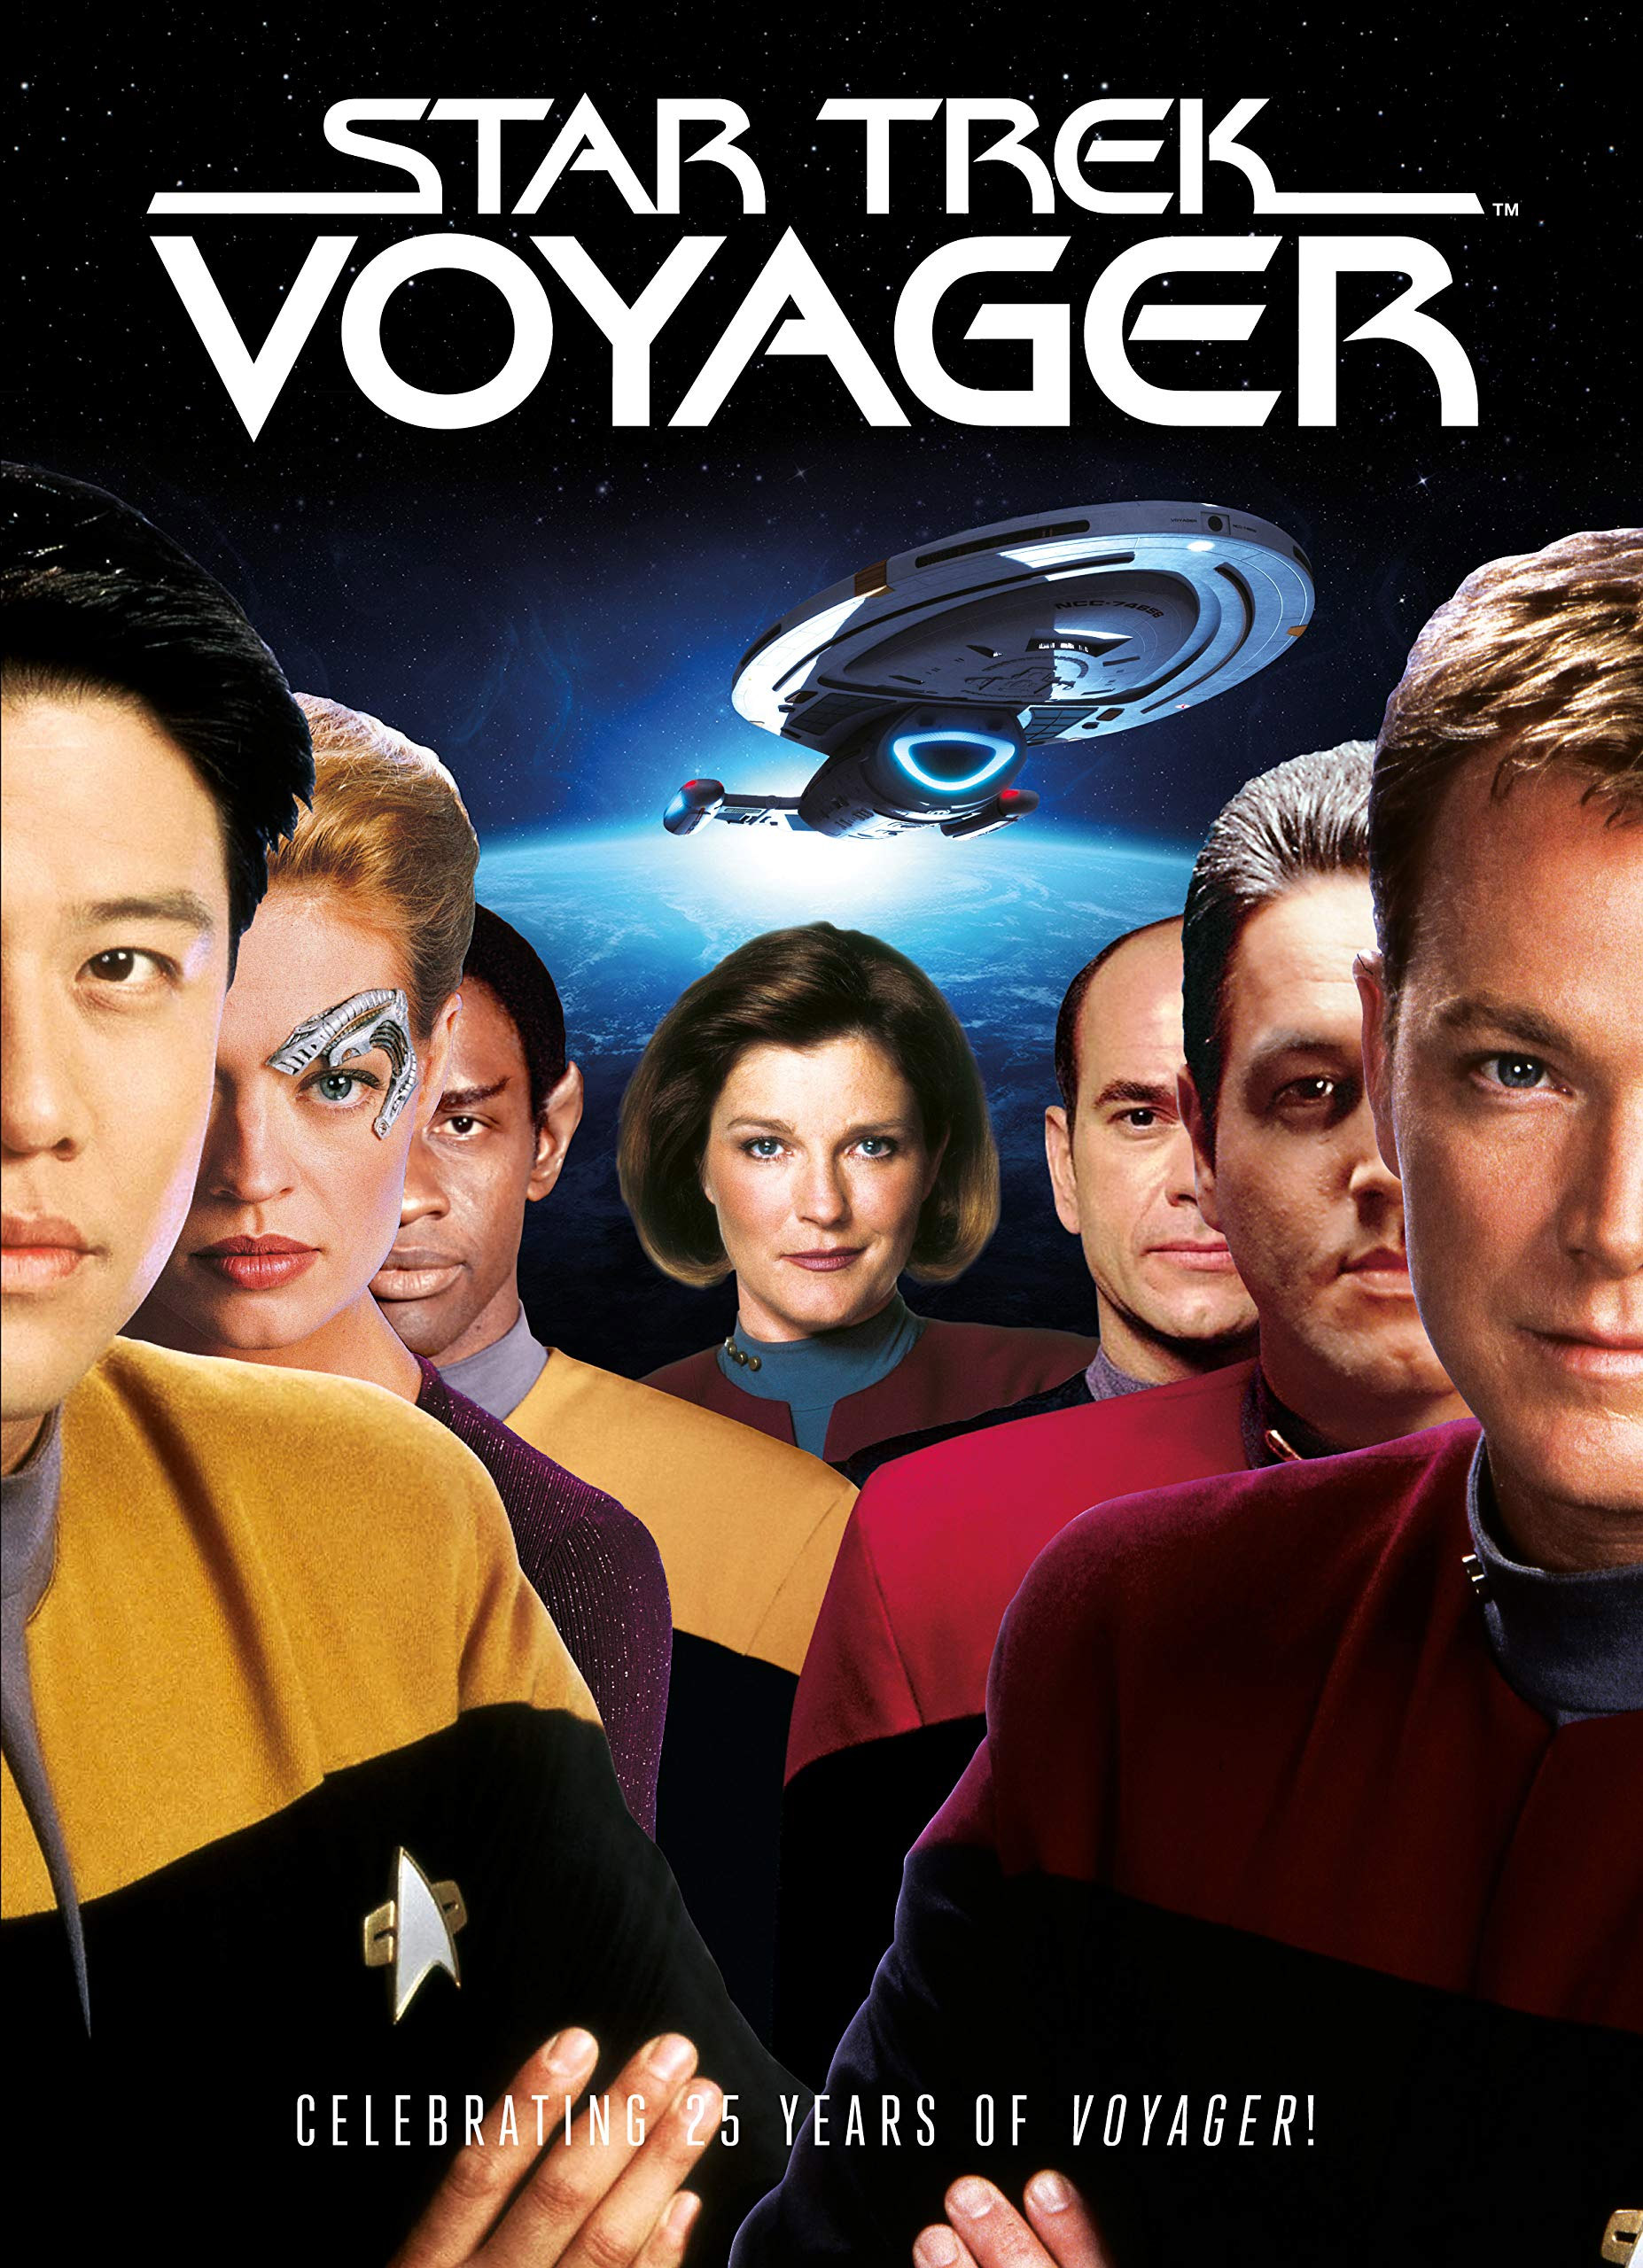 #FCZBsommertipps - FILM: Star Trek Voyager